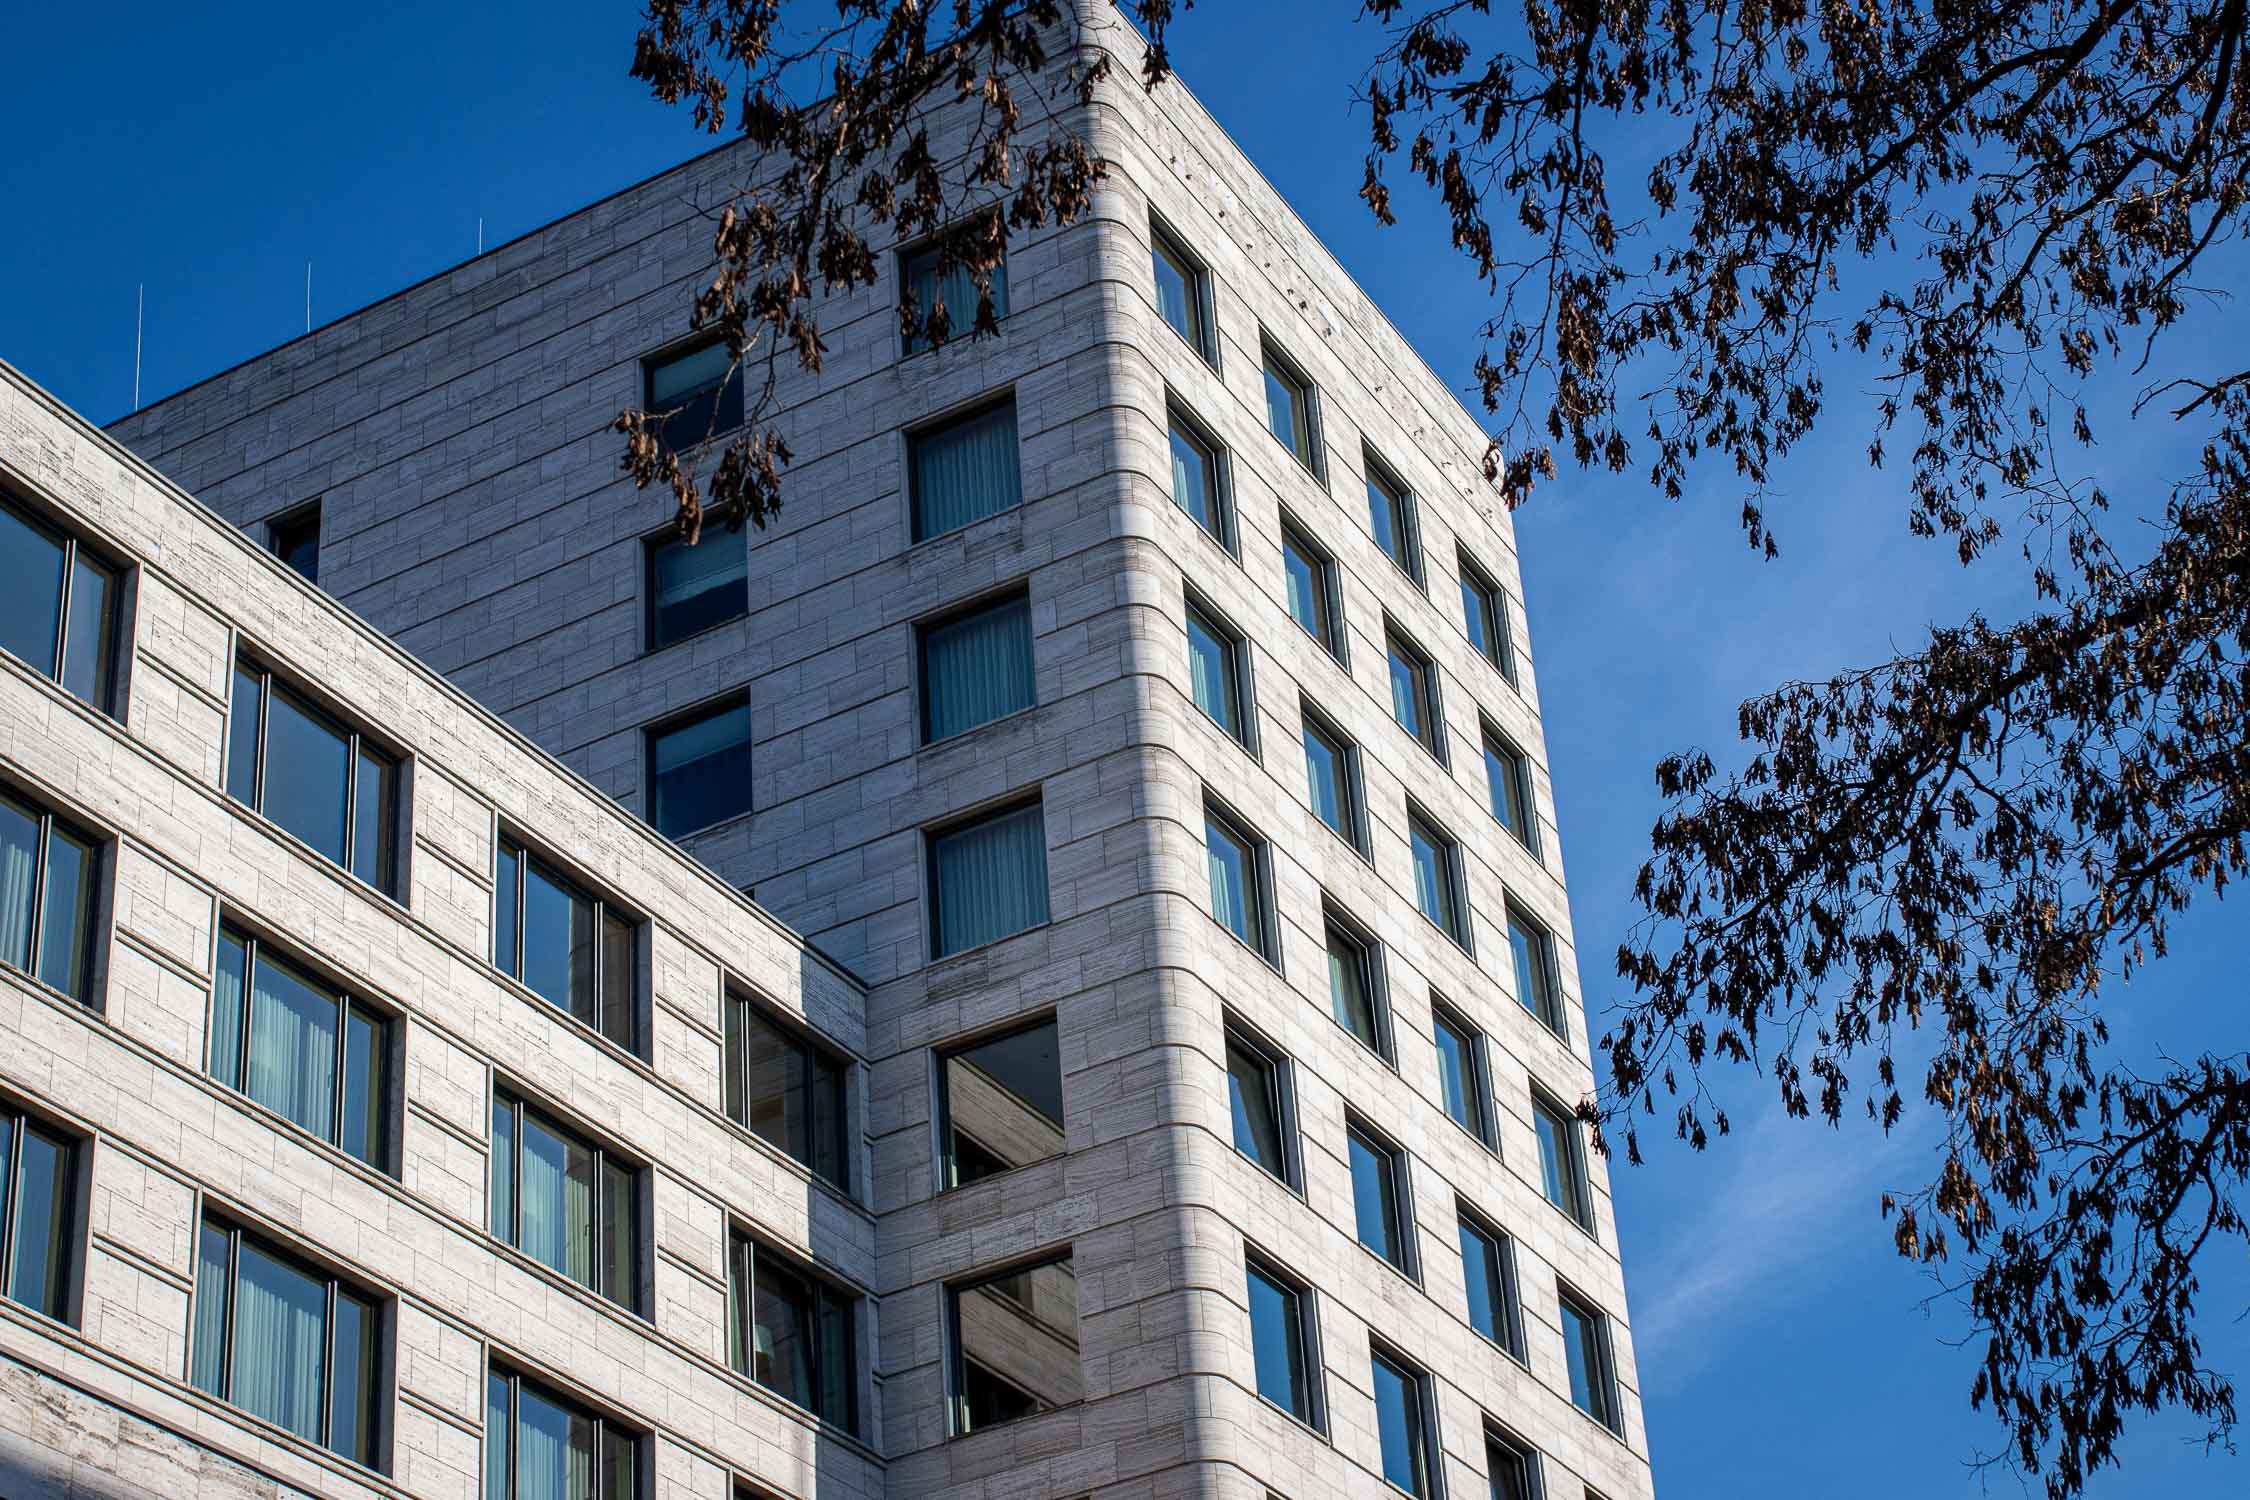 JW Marriott Hotel Berlin Erfahrungsbericht